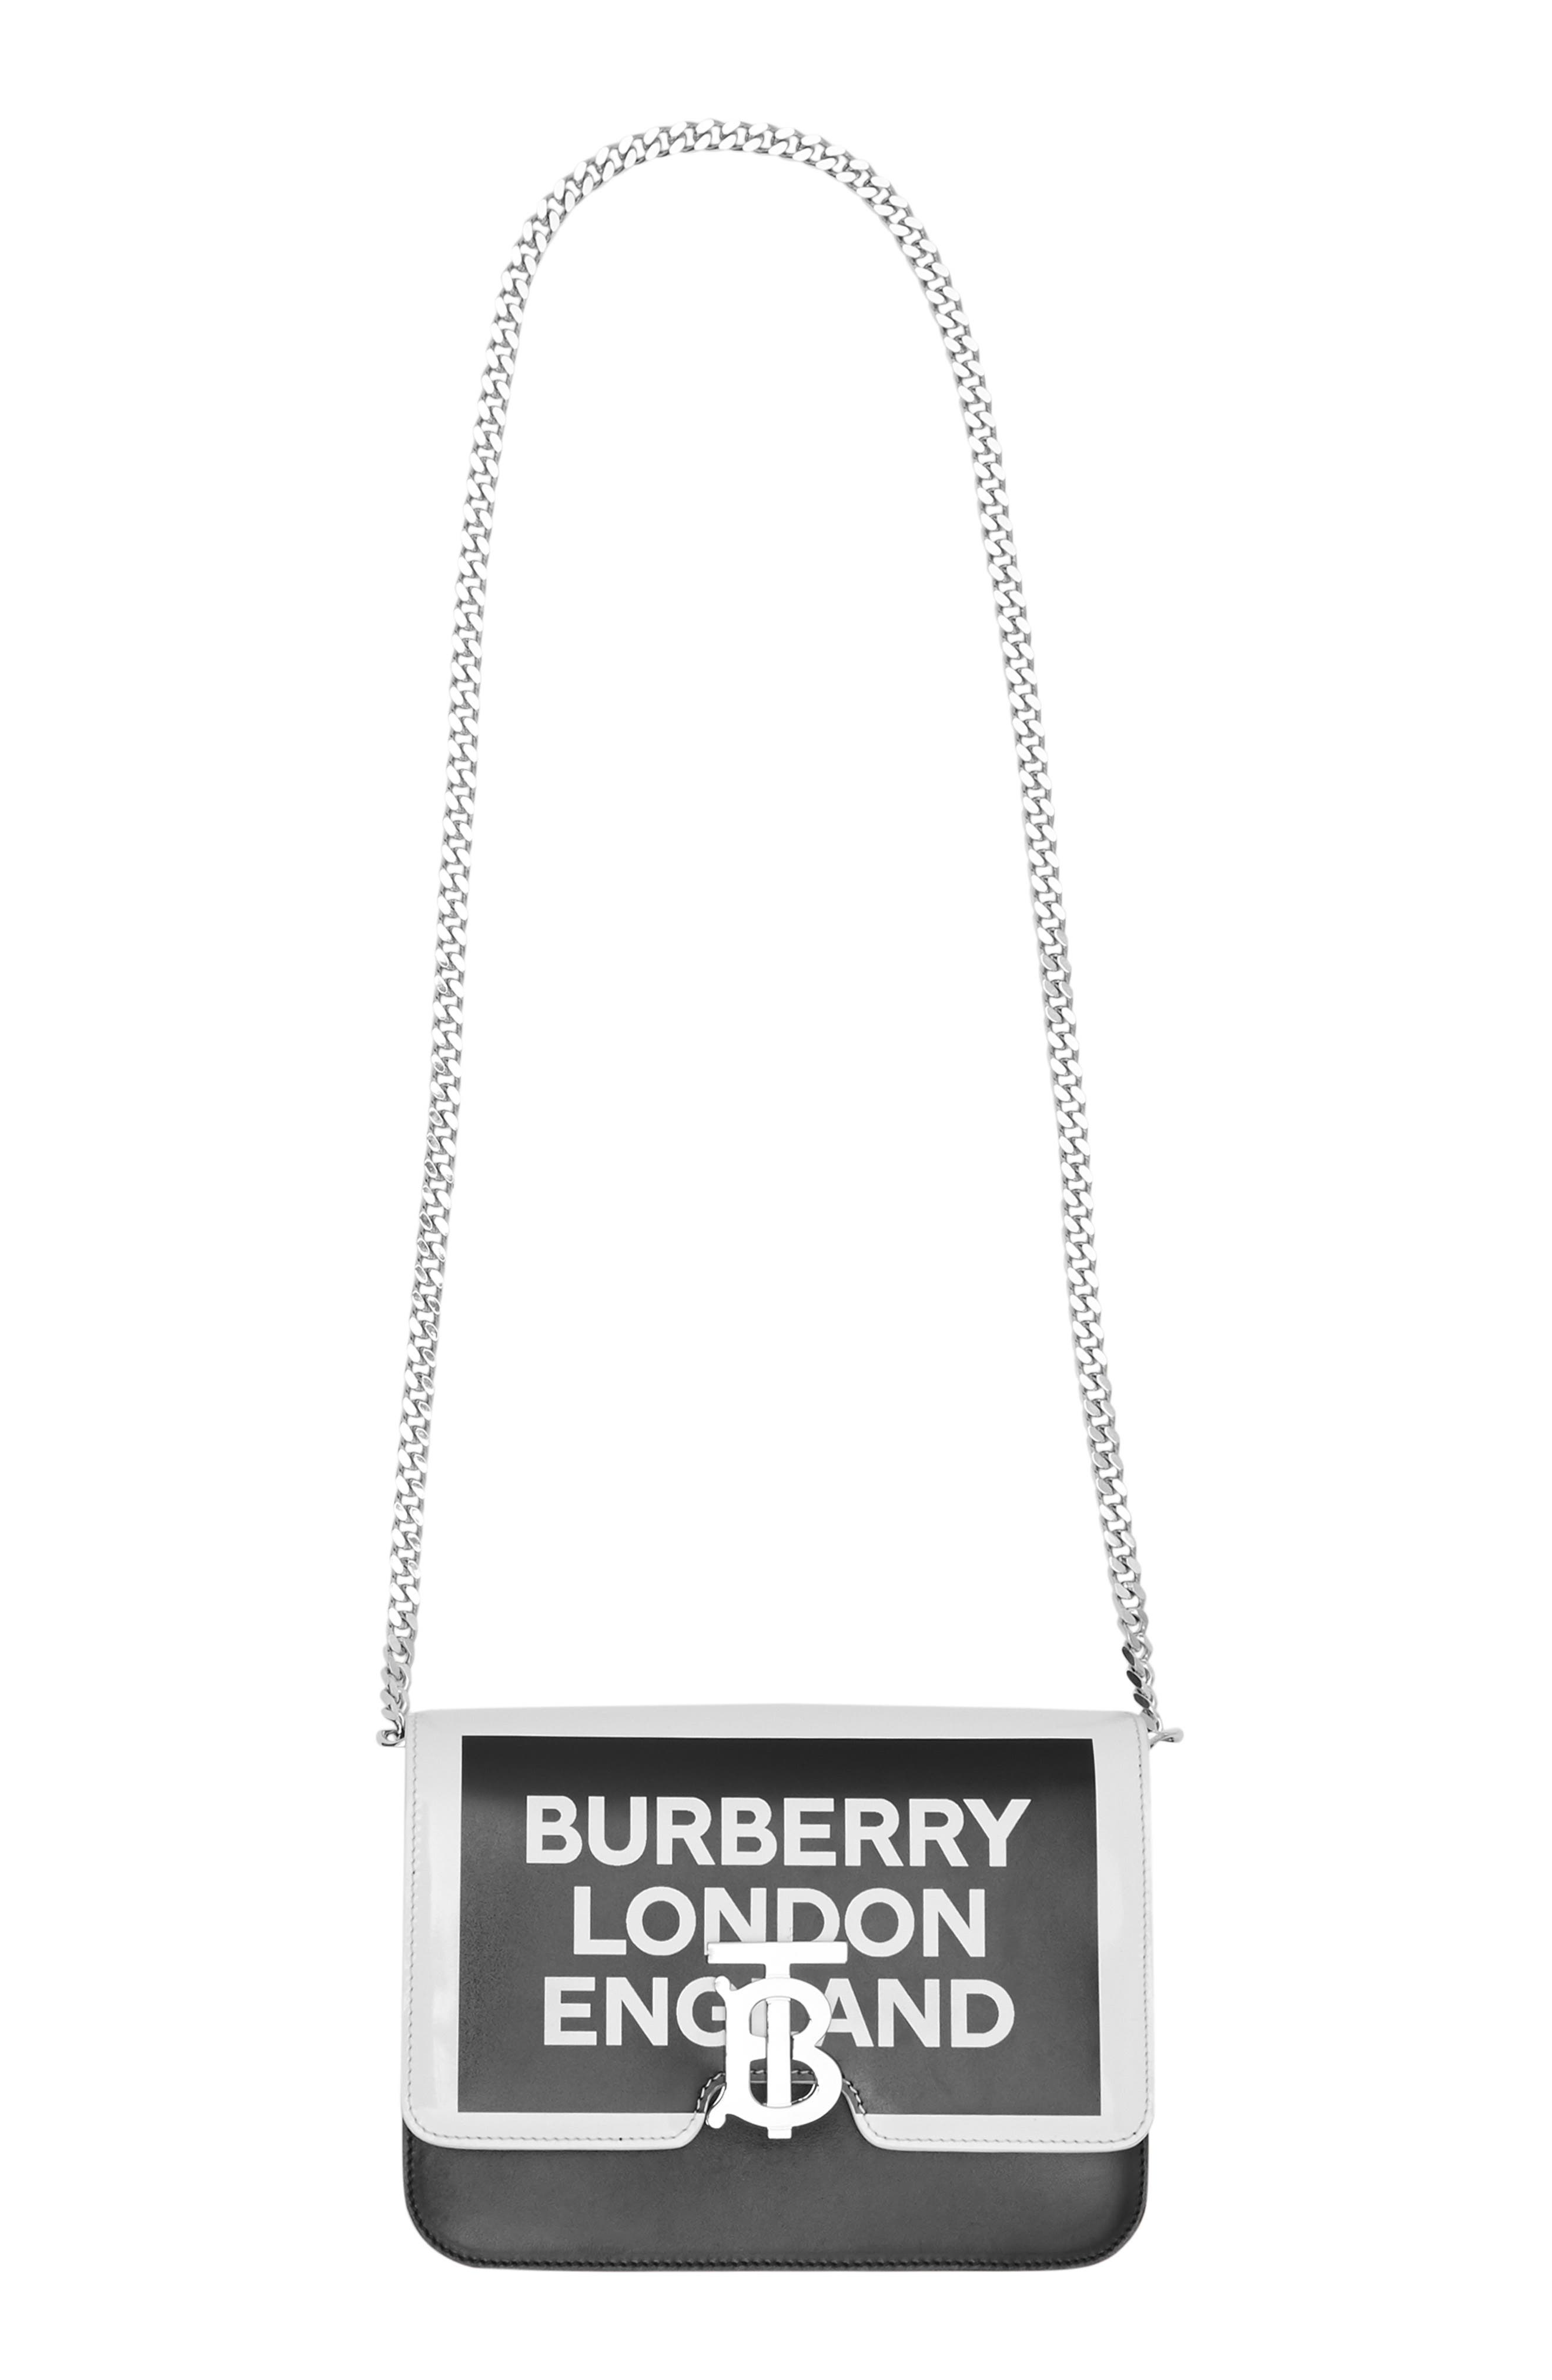 BURBERRY, Small Painted Edge Logo TB Crossbody Bag, Main thumbnail 1, color, 001